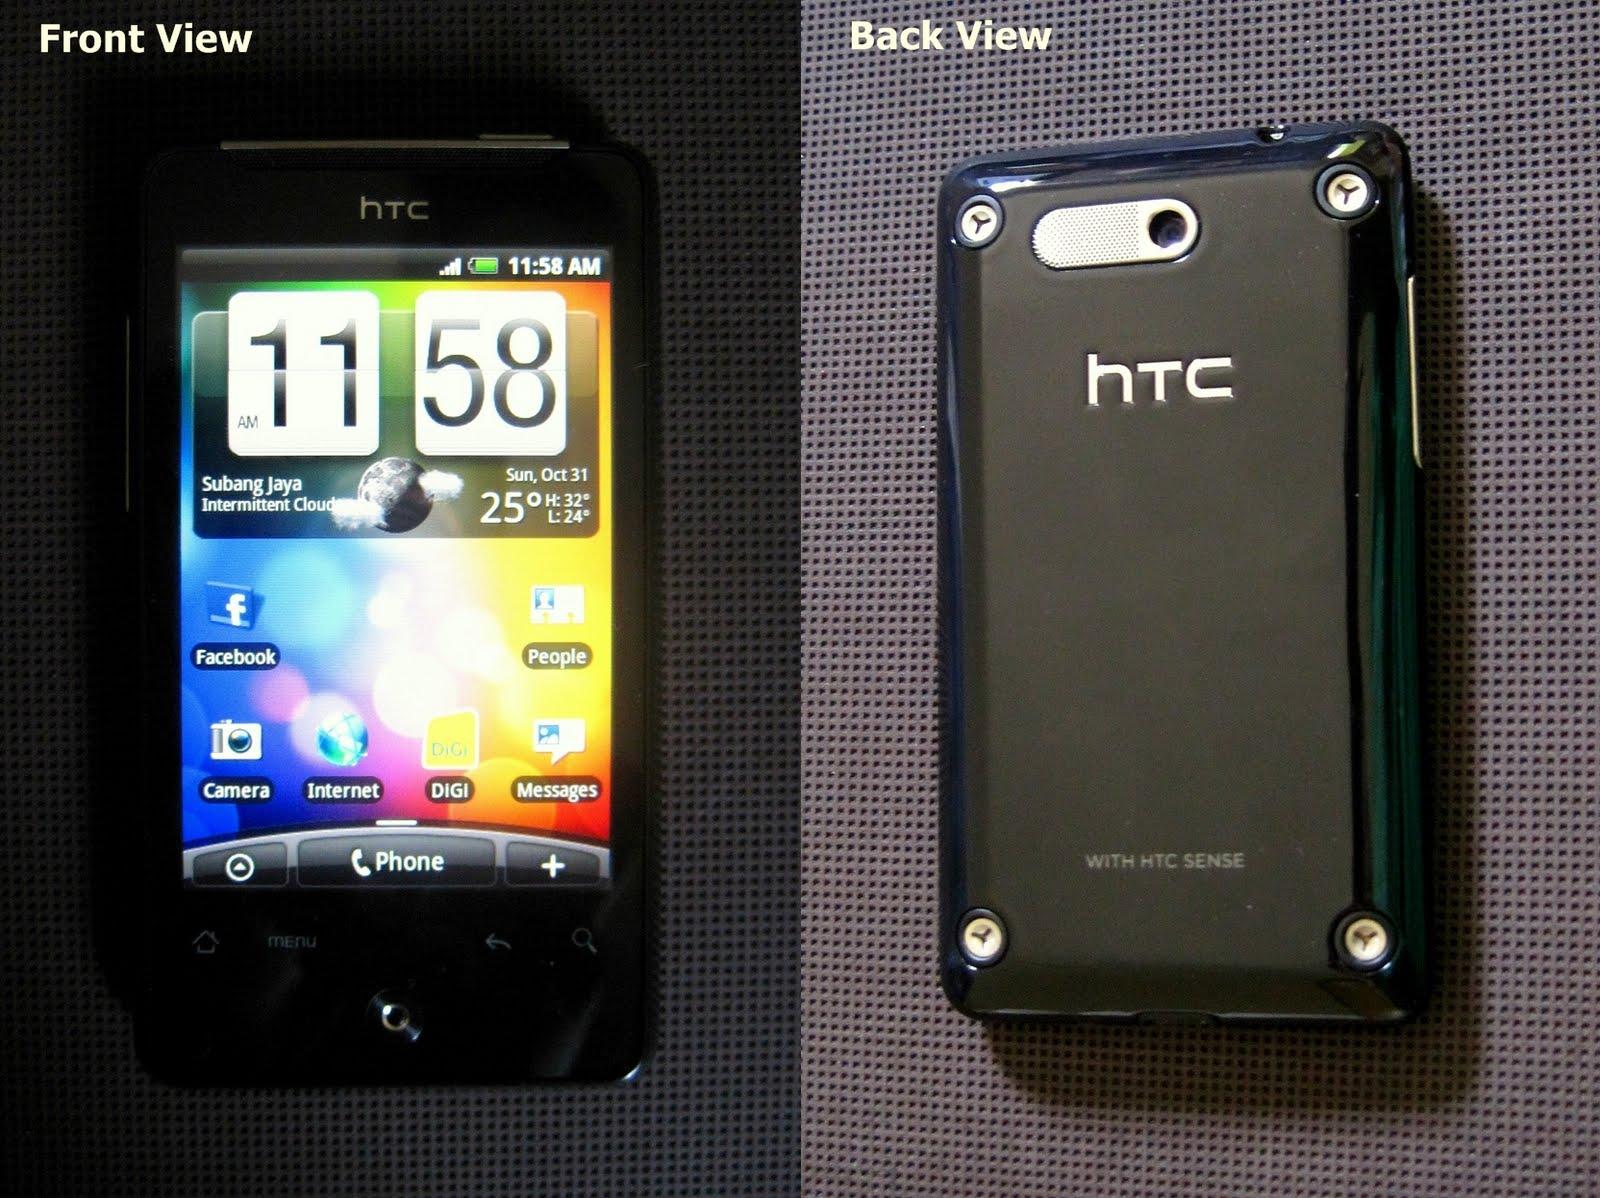 http://1.bp.blogspot.com/_owNLTask15k/TM7c7Hw0N_I/AAAAAAAAFUs/CYDOiJVwfgY/s1600/HTC%2BAria.jpg